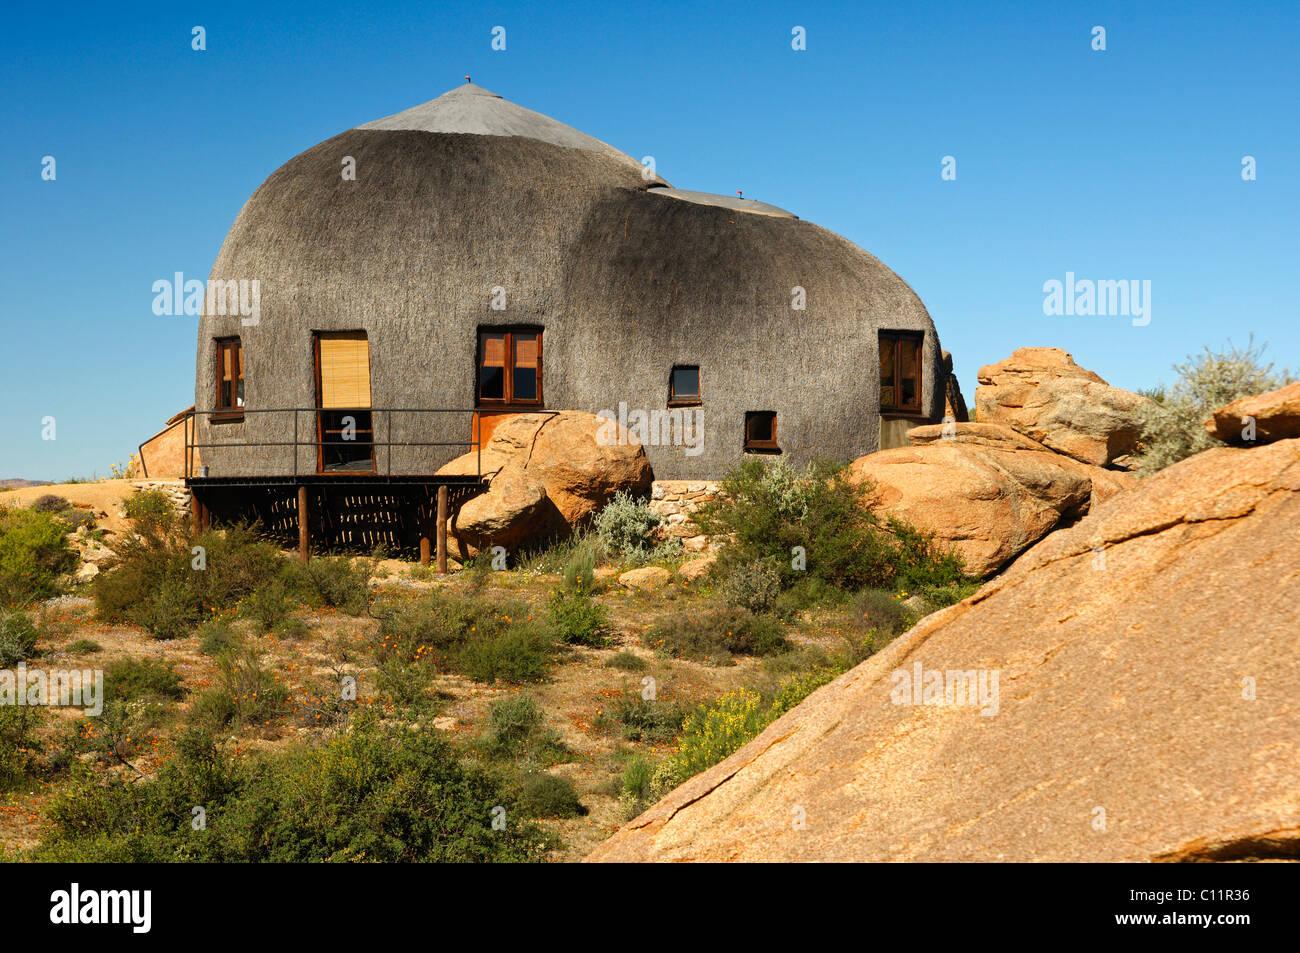 Thatched Namakwa Mountain Suite, Naries Namakwa Retreat, Naries, South Africa, Africa - Stock Image